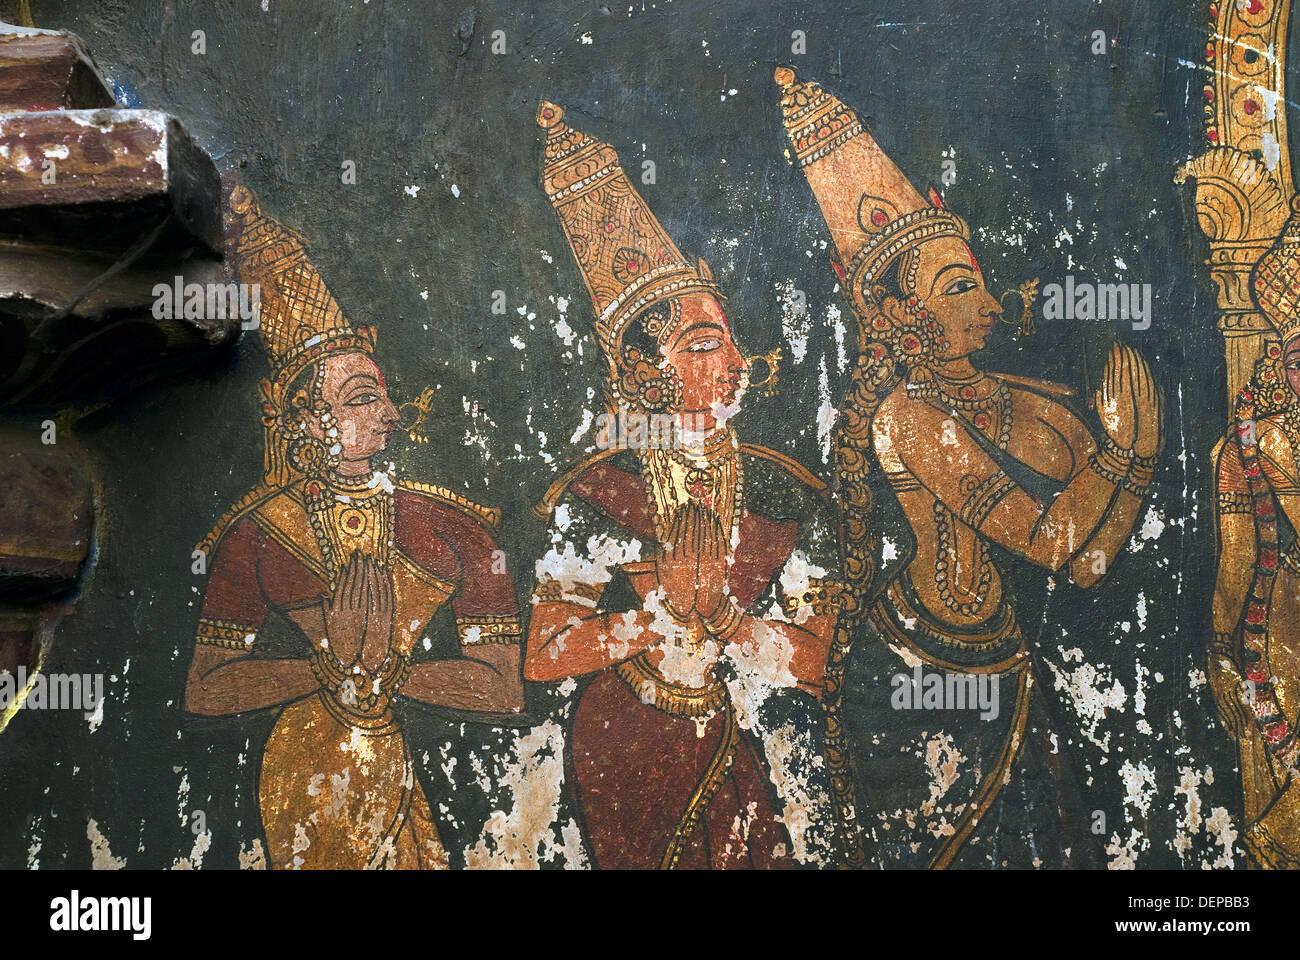 17th century Murals in Varadaraja Perumal (Vishnu) temple in kanchipuram,  Tamil Nadu, India. Varadaraja Perumal temple is an Stock Photo - Alamy